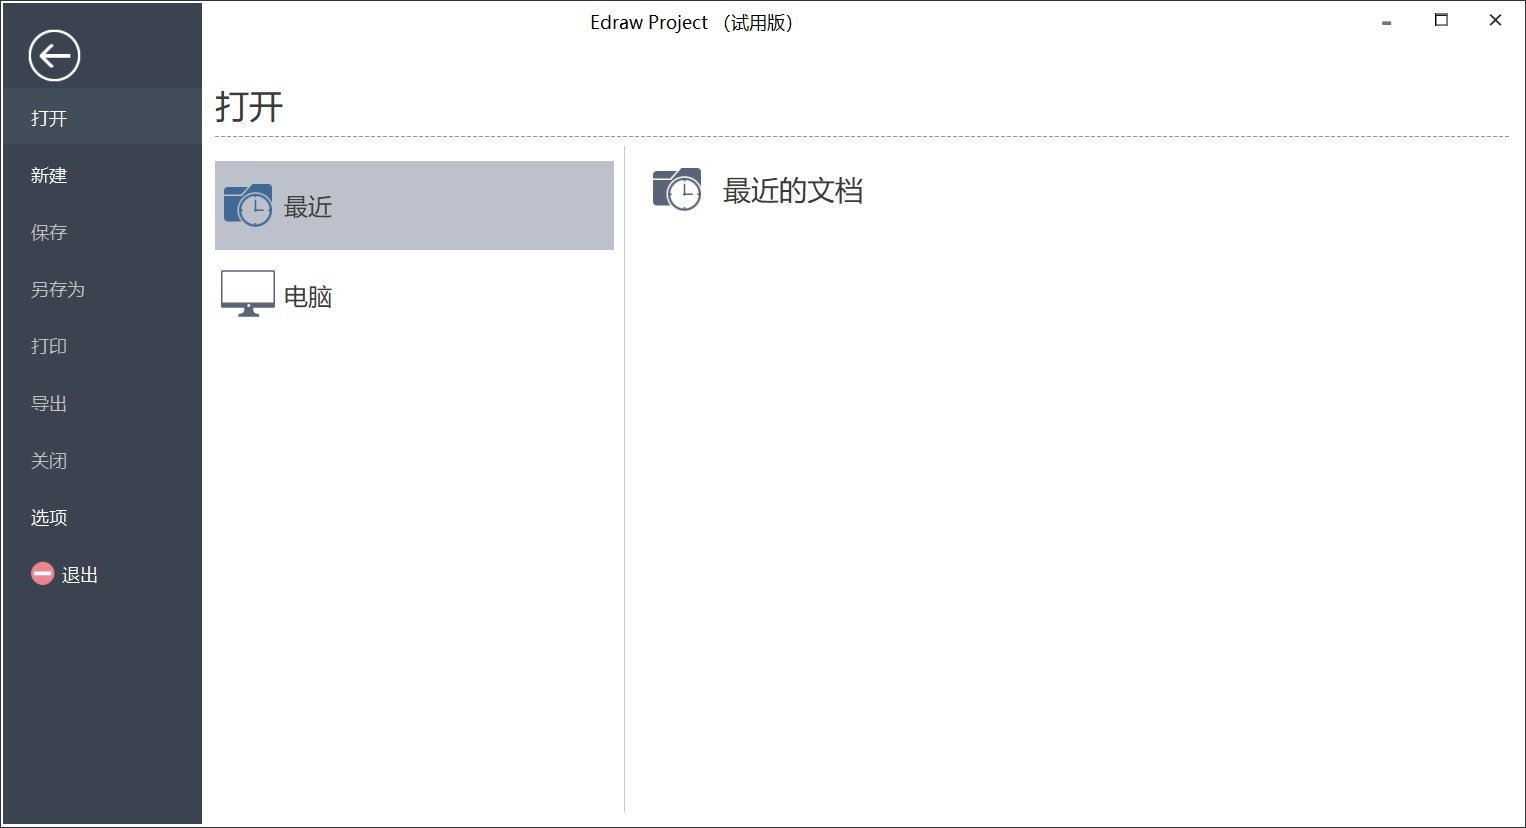 Edraw Project 破解版.jpg